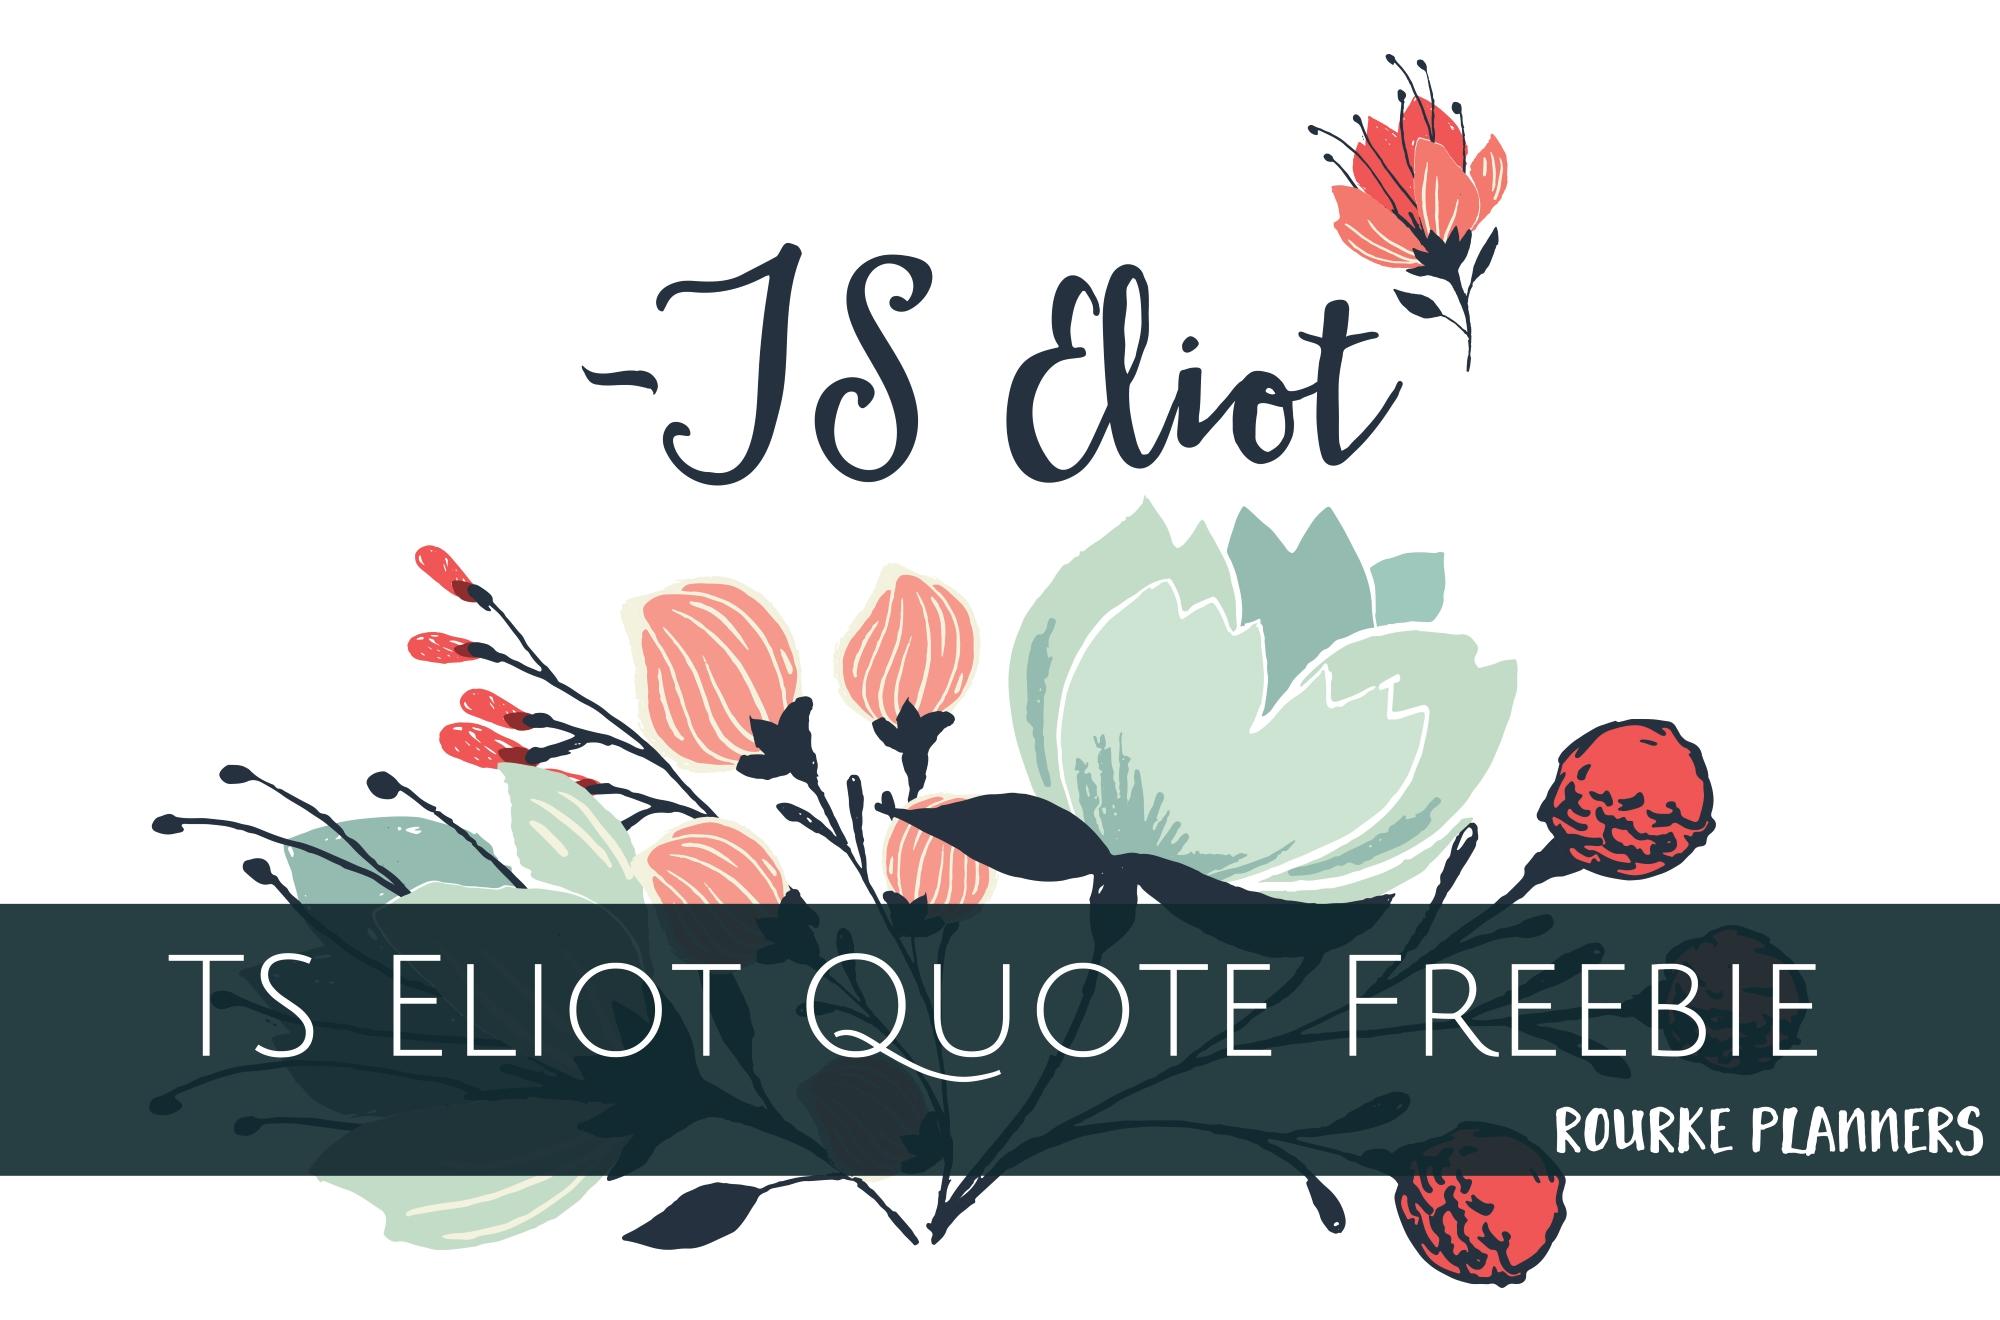 TS Eliot Quote Freebie | Rourke Planners